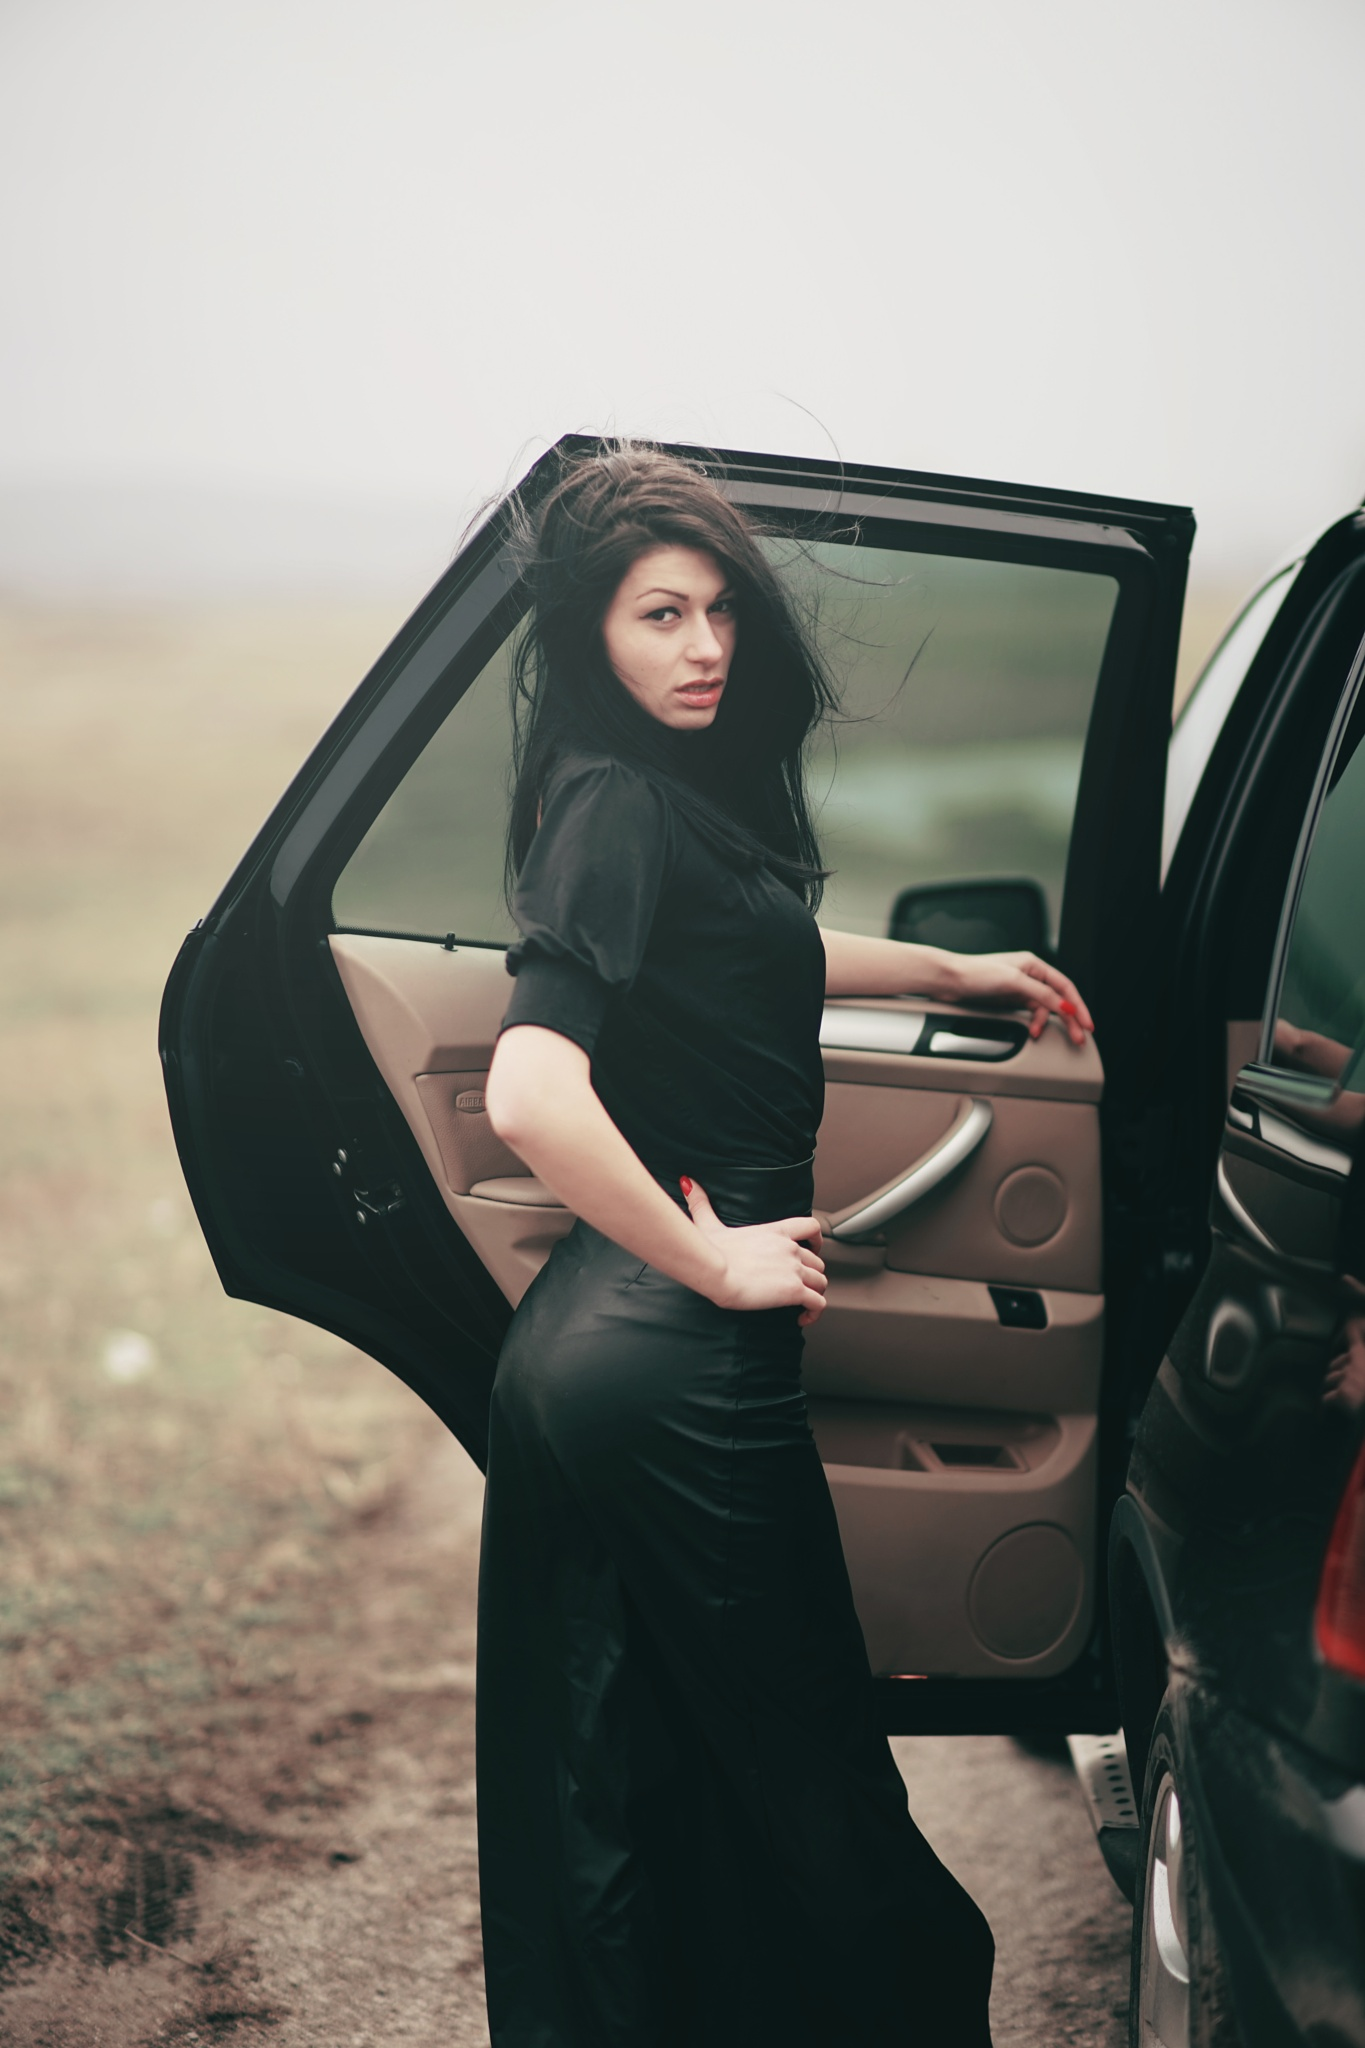 Dayana by Martin Ivanov